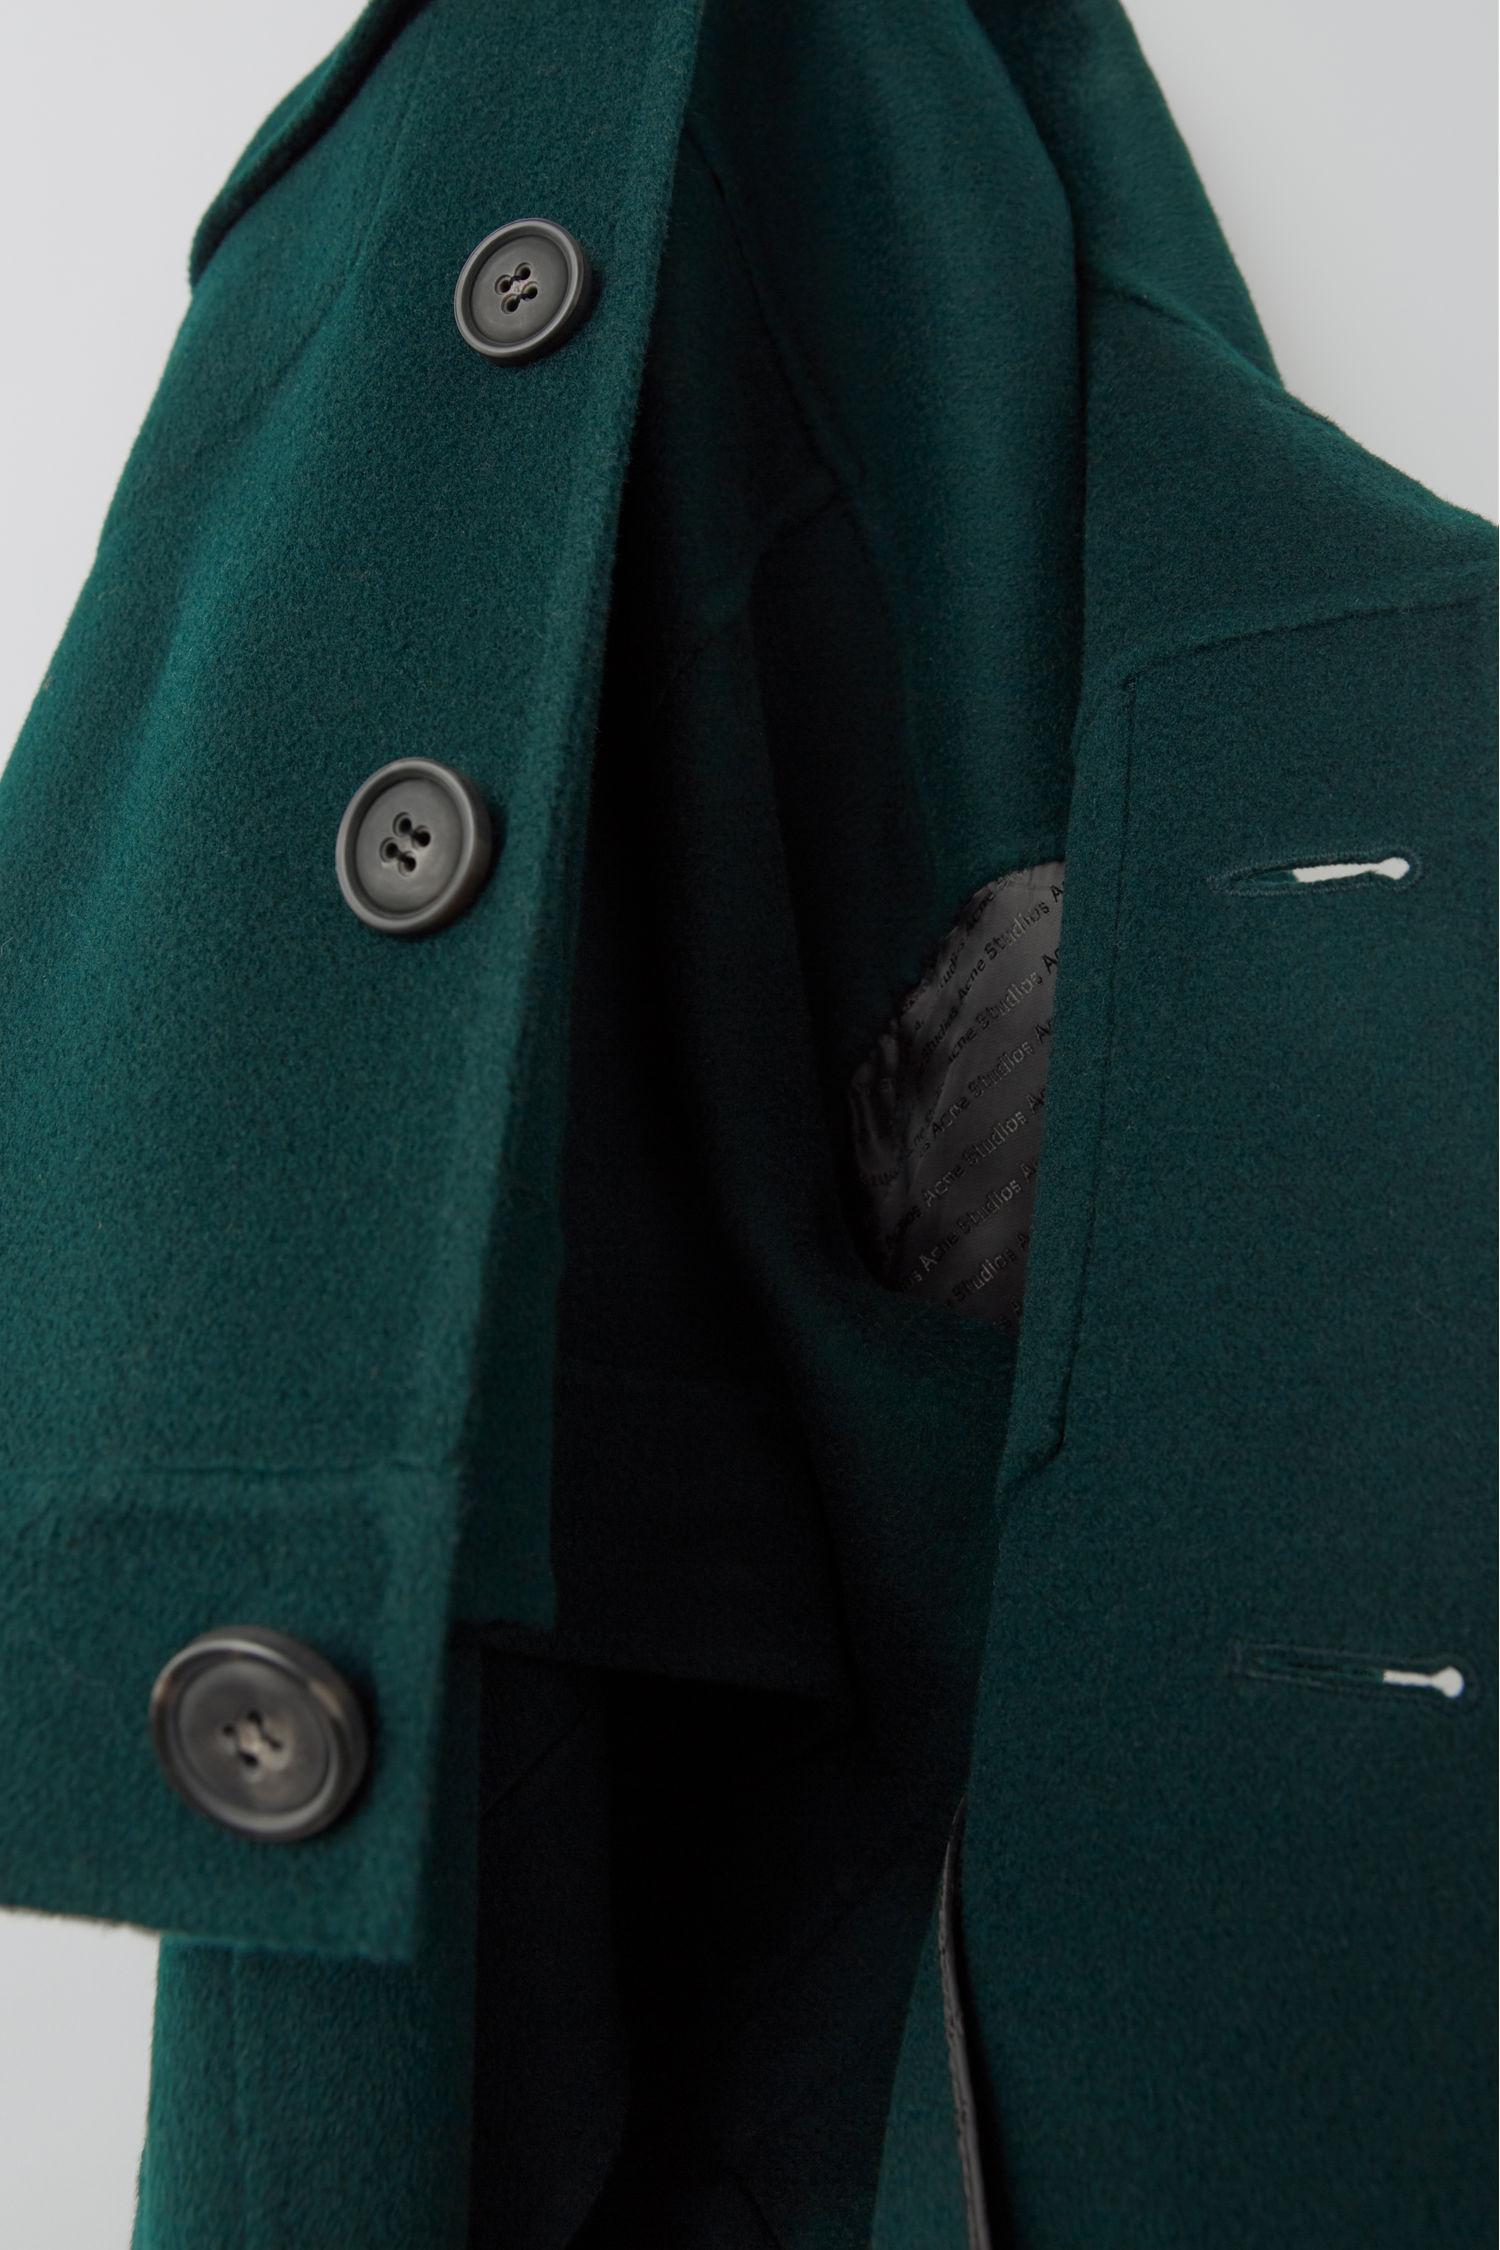 acne_studios_Cropped_oversized_jacket_bottle_green_2.jpg